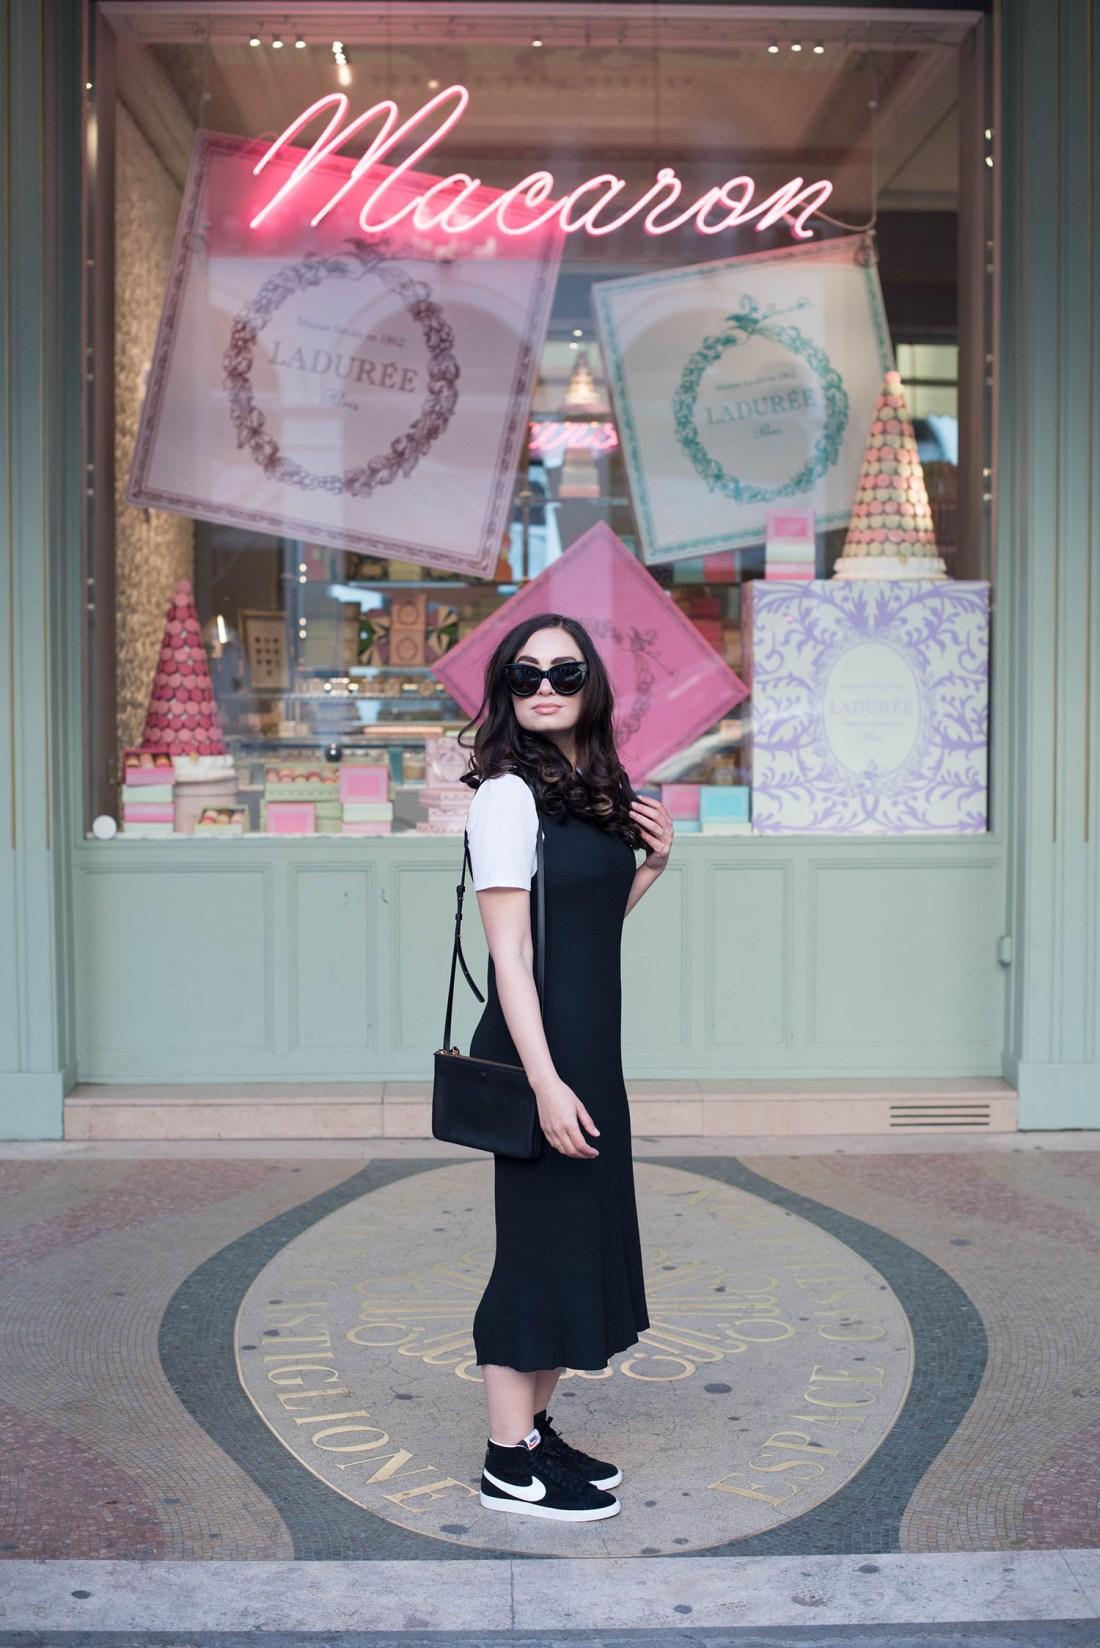 Photo of fashion blogger Cee Fardoe of Coco & Vera, wearing a Metisu dress and Celine trio bag at Laduree